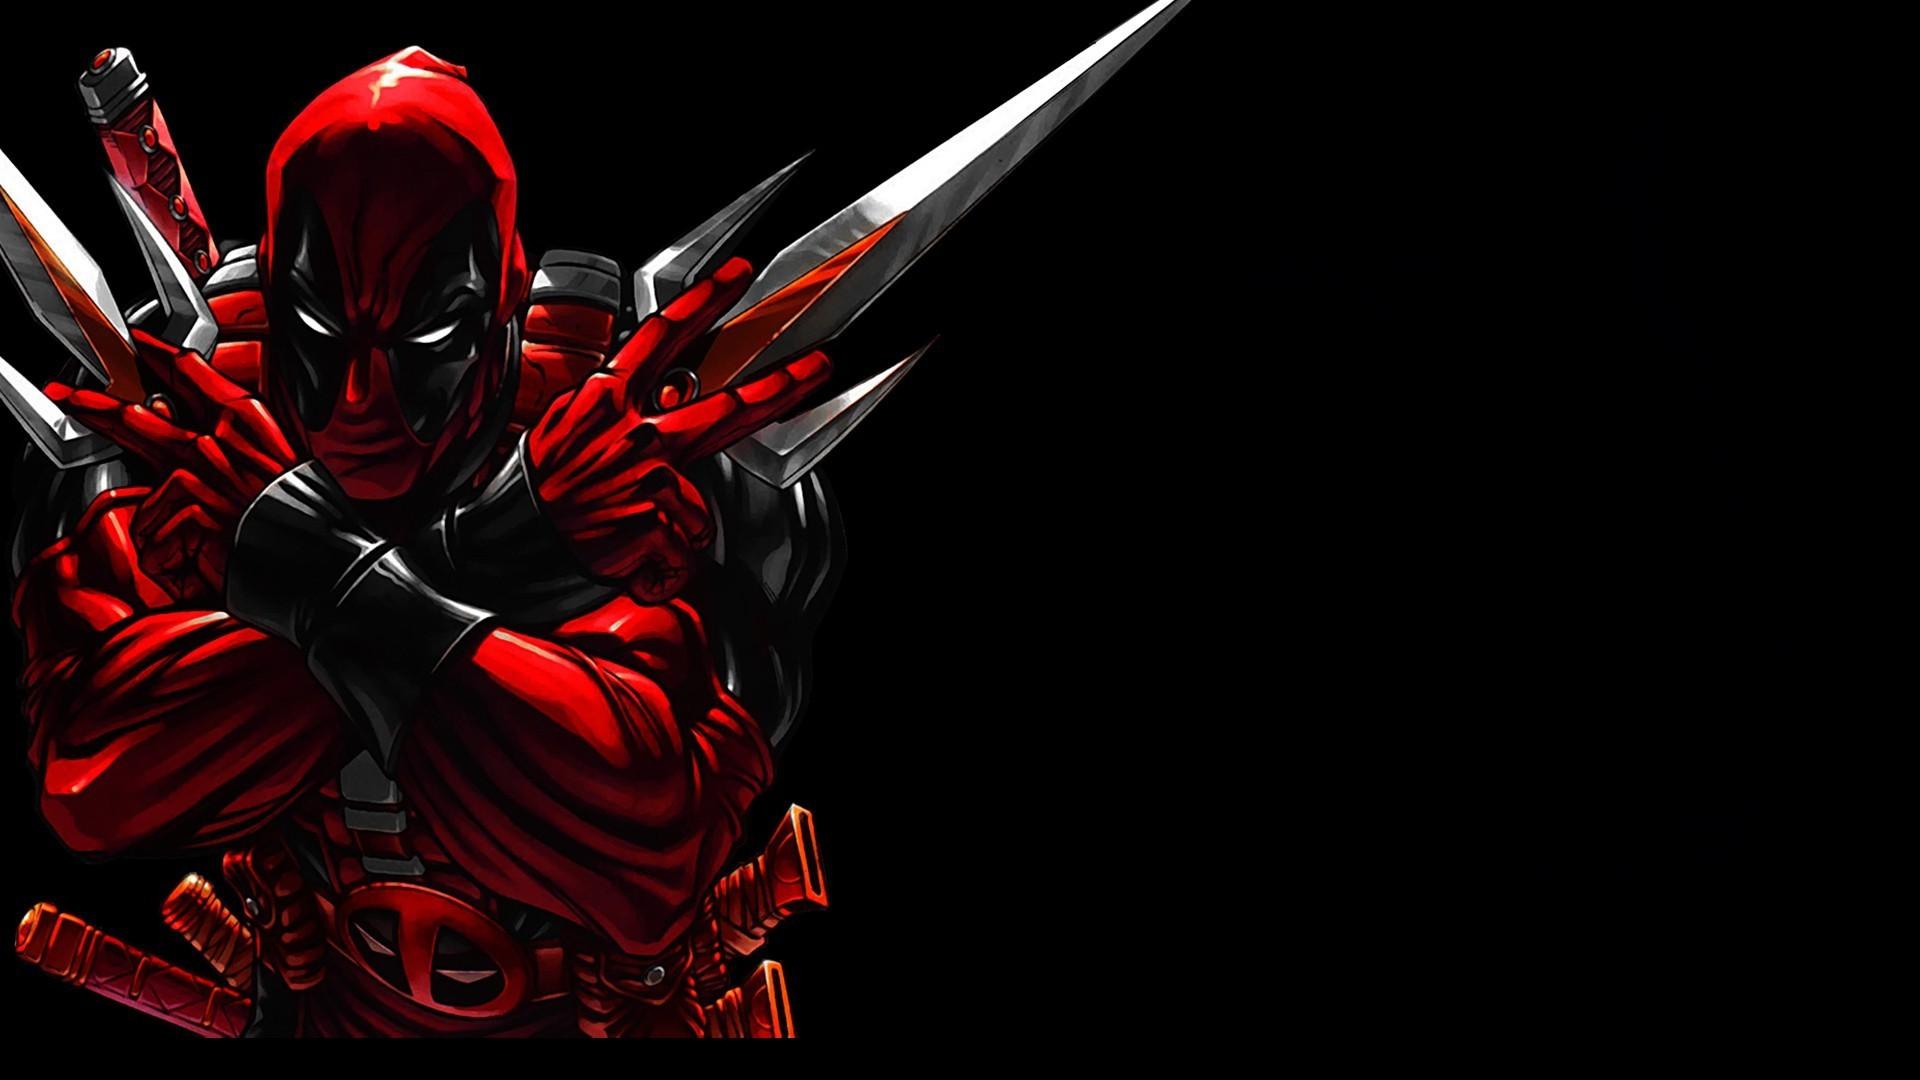 comics, Wolverine, X Men, Marvel Comics, Beast (character), Deadpool, Gambit,  Rogue Wallpaper HD